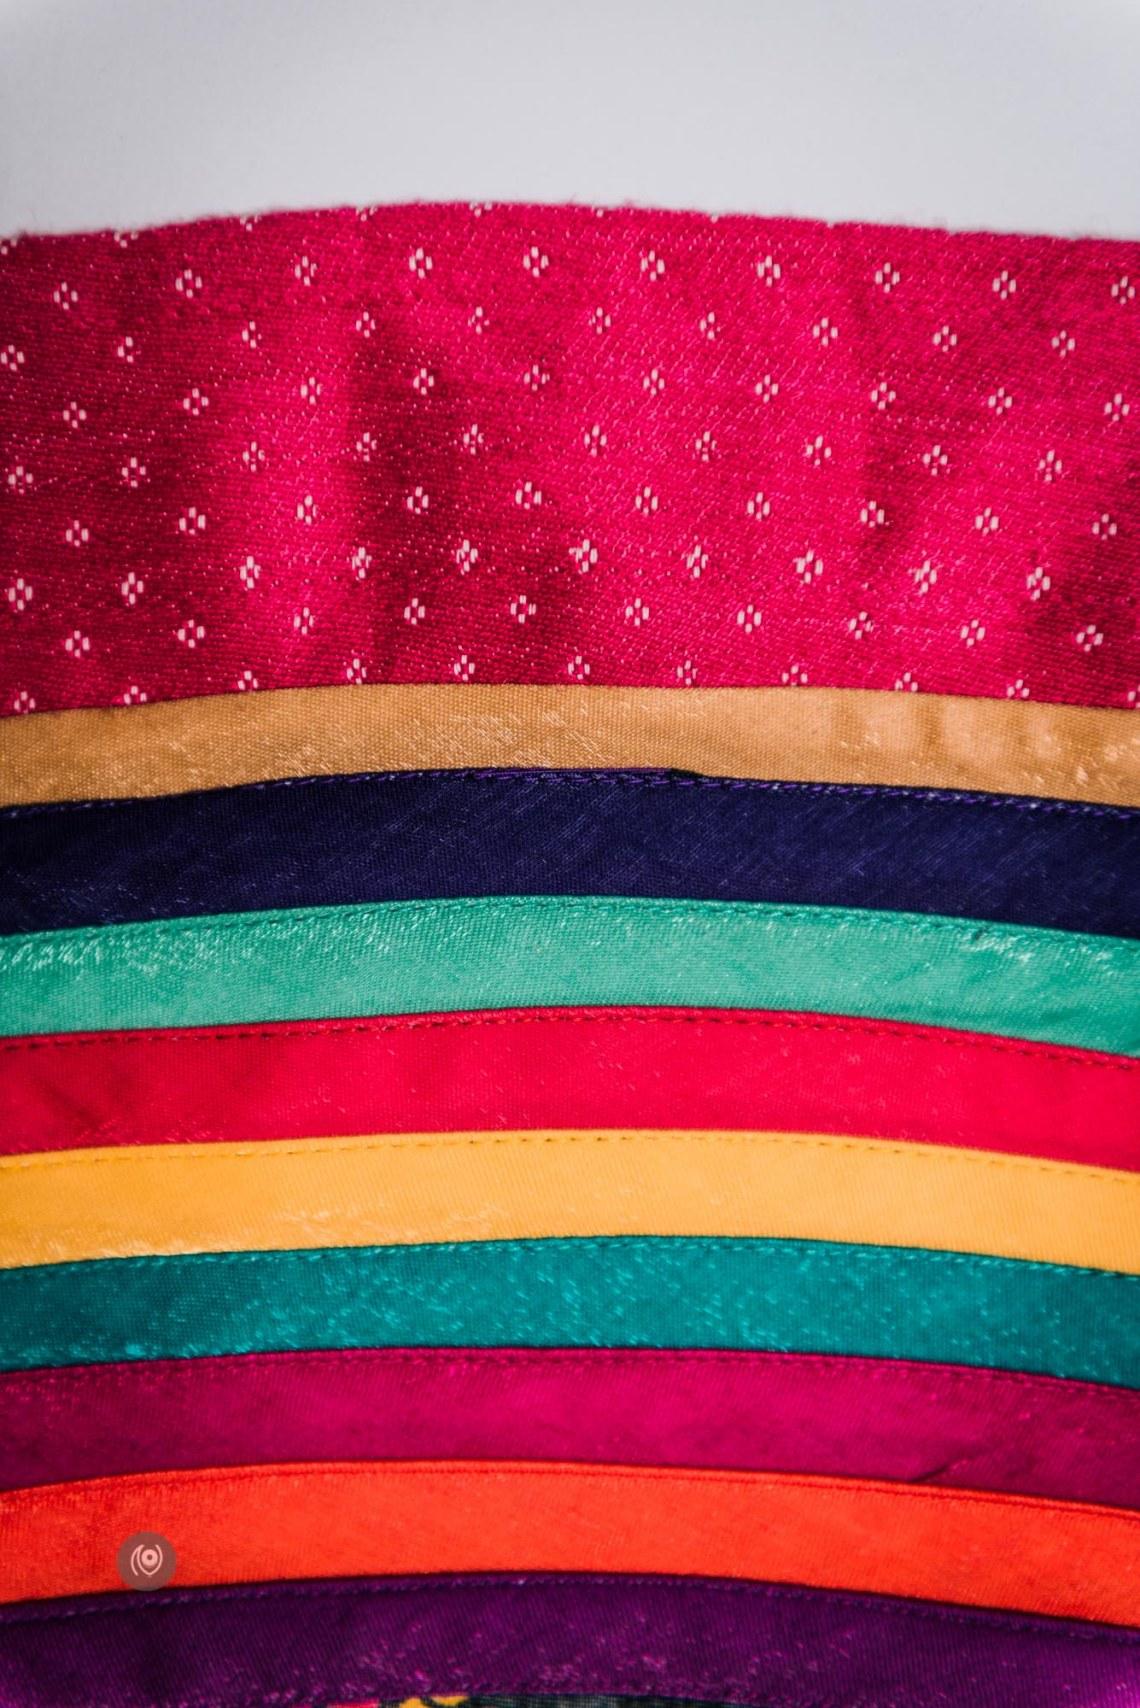 #CoverUp 64 #MadeInIndia vraj:bhoomi, Diaries of Nomad, Harshita Gautam, Ghaagra, Chanderi Silk, Tribal India, Flying Fish Accessories, Poem Bags, Naina.co, Naina Redhu, Luxury Photographer, Lifestyle Photographer, Luxury Blogger, Lifestyle Blogger, Experience Collector, Personal Style, #MadeInIndia, #CoverUp